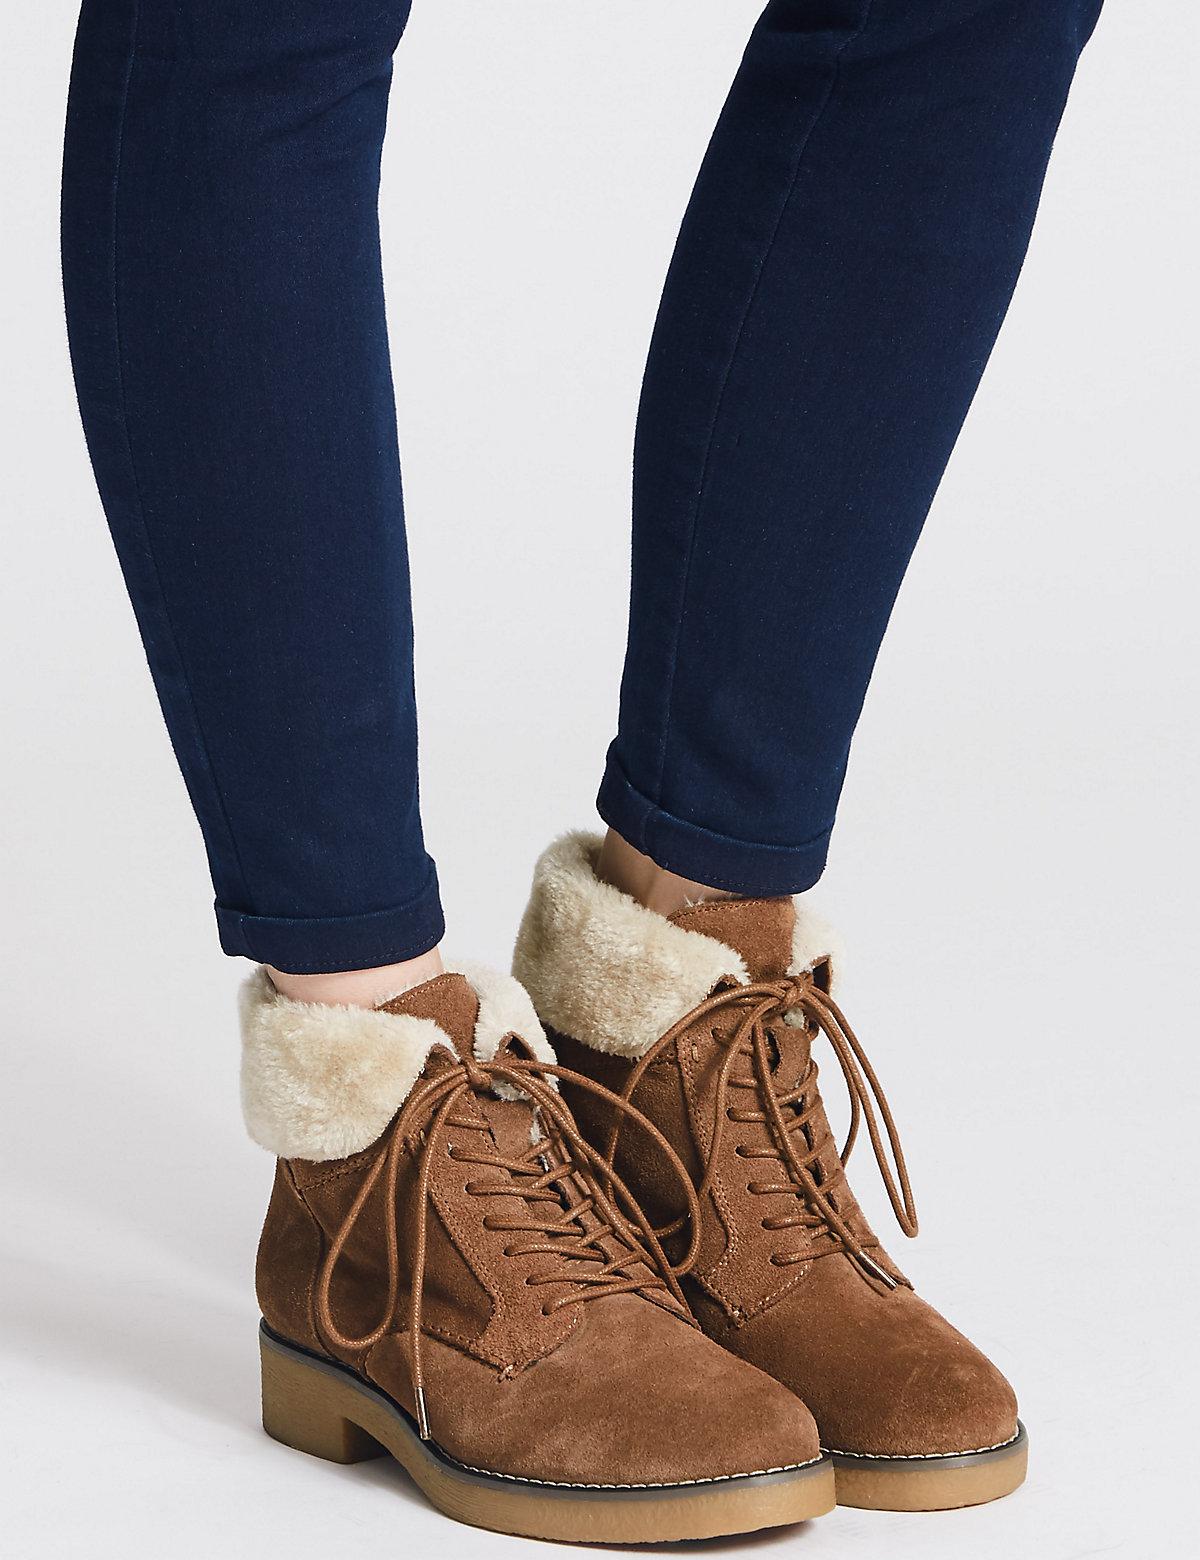 Currys Shoes Flat Heel